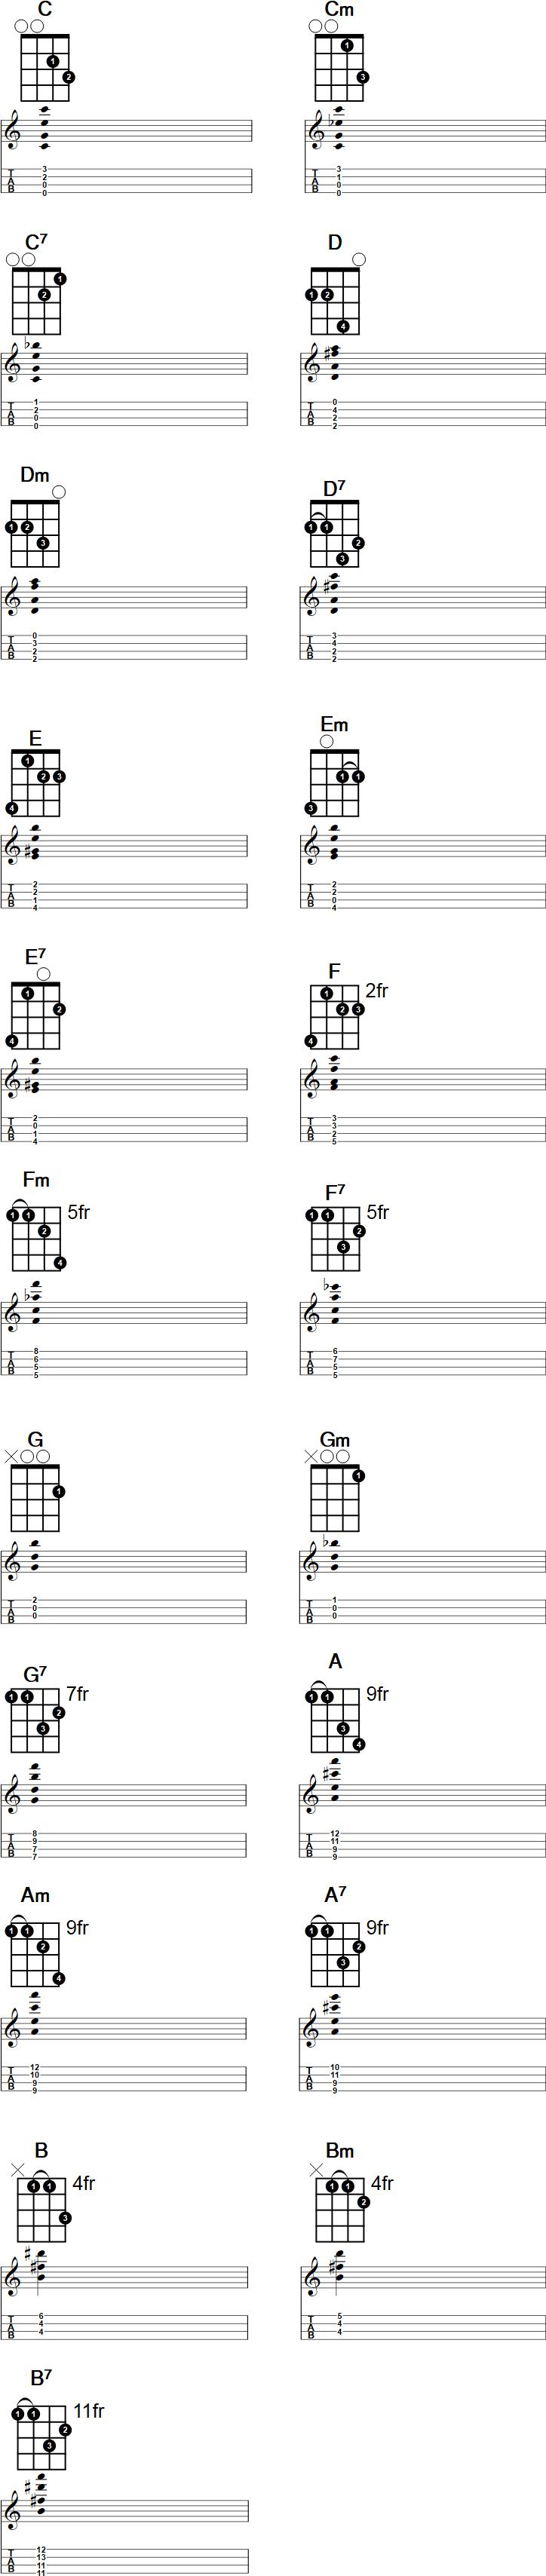 Tenor Banjo Chords In Standard Tuning Free Printable Pdf Download